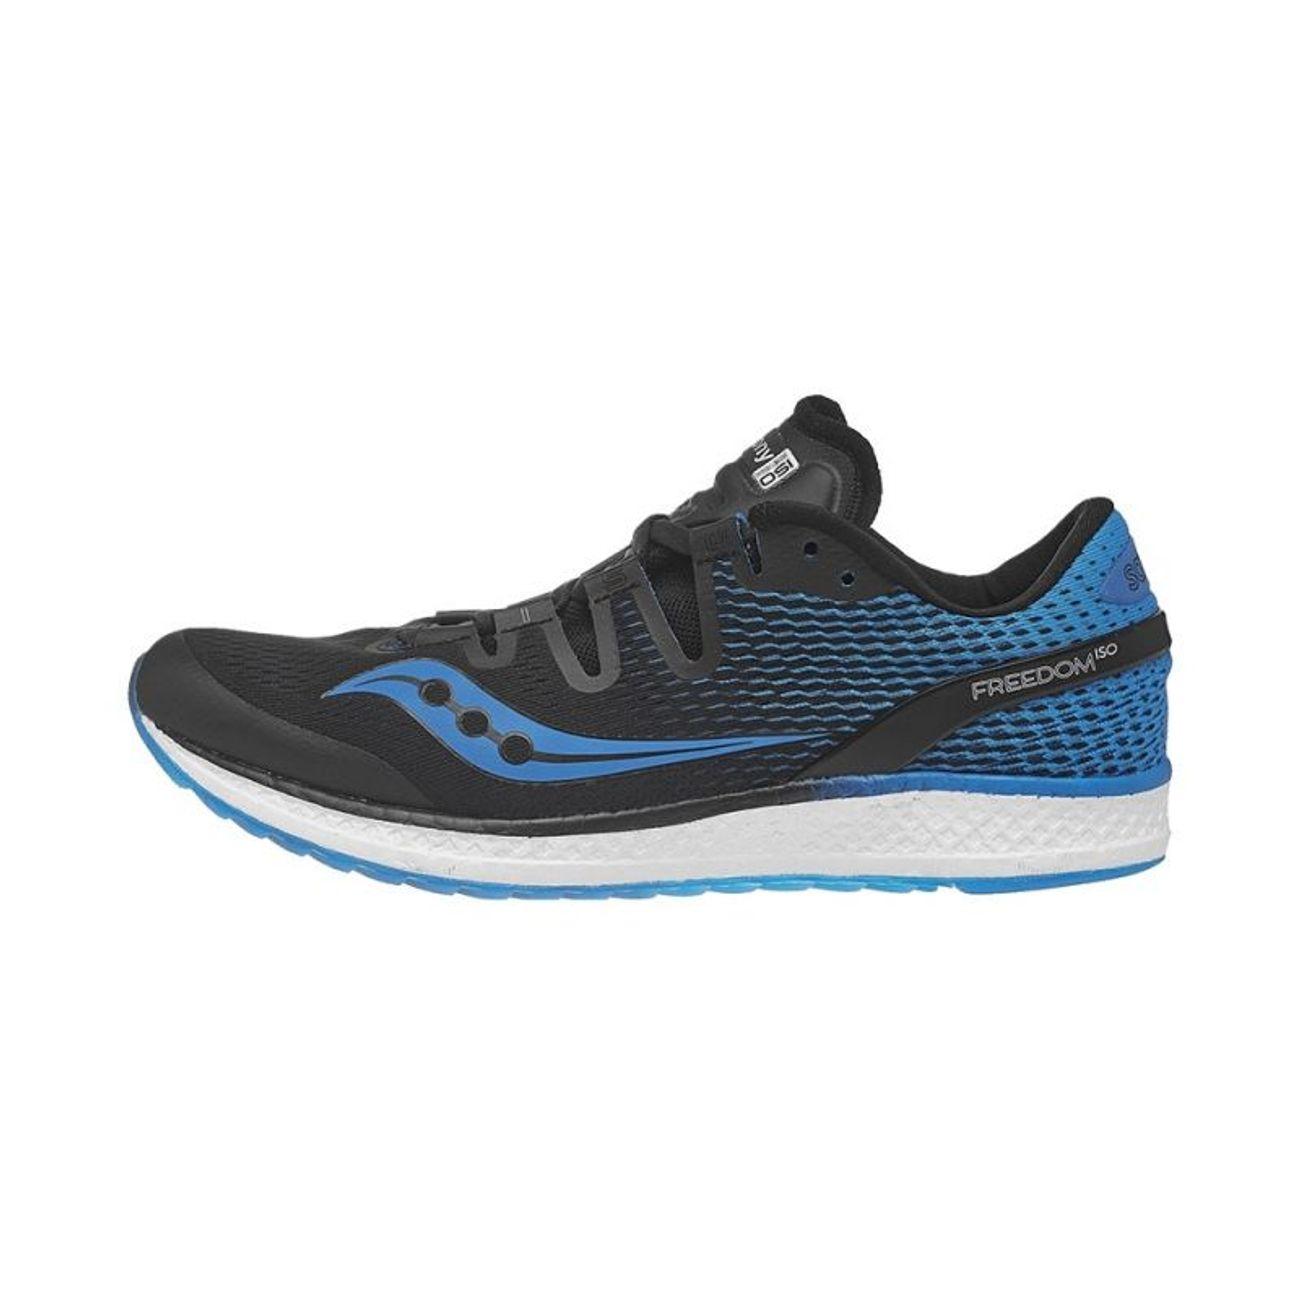 Running Freedom Noir Iso Bleu Homme Saucony Chaussures OnPk0w